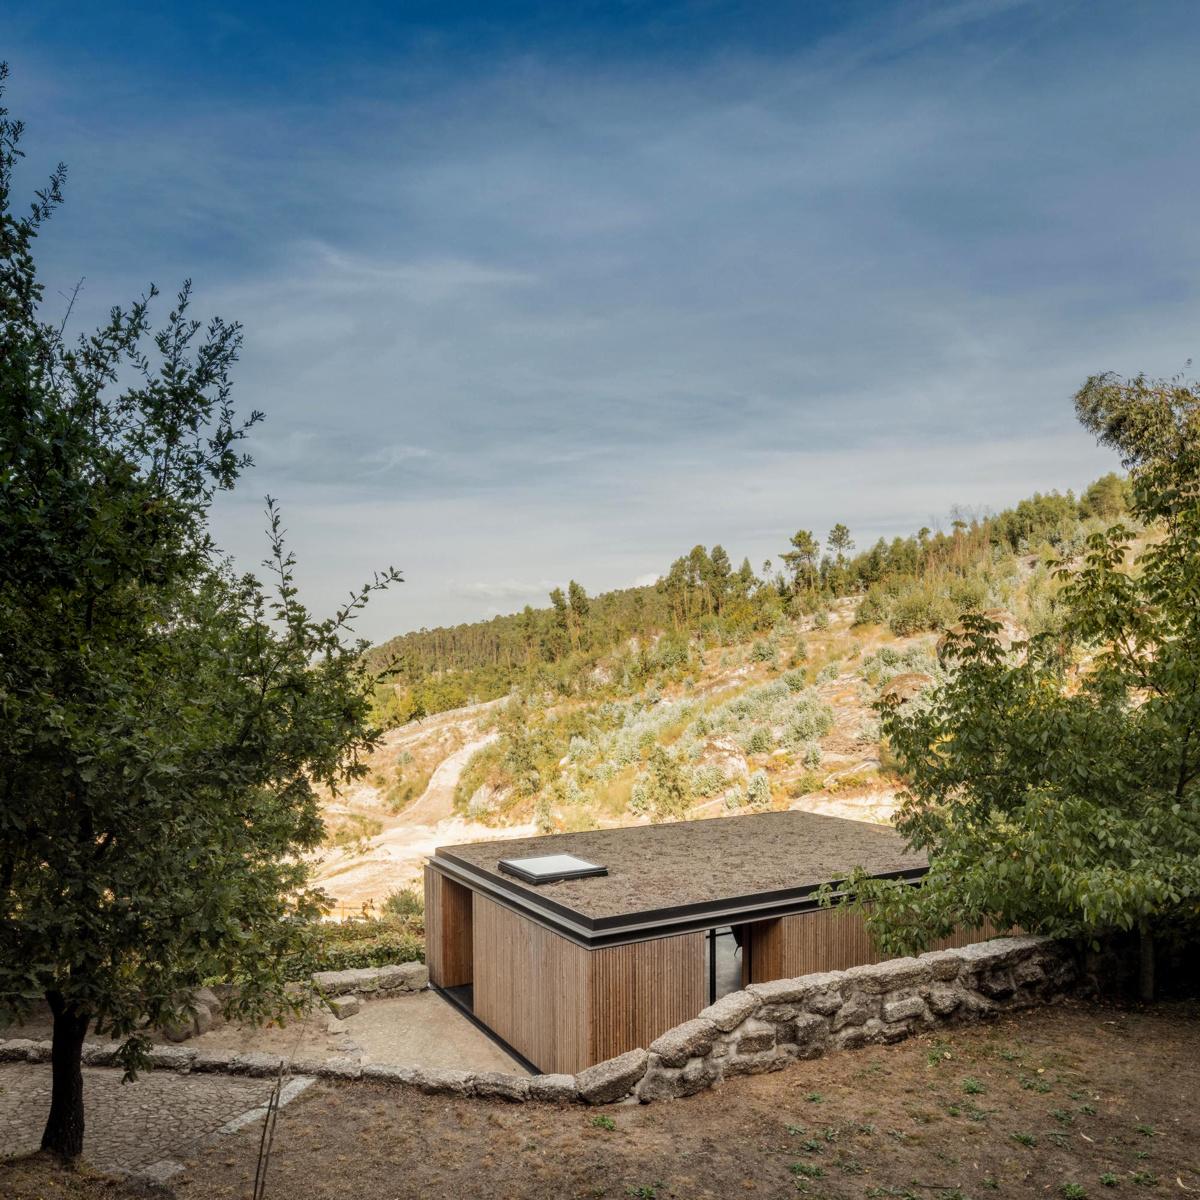 Andreia Garcia Architectural Affairs (Португалия). Дом вместо винного погреба